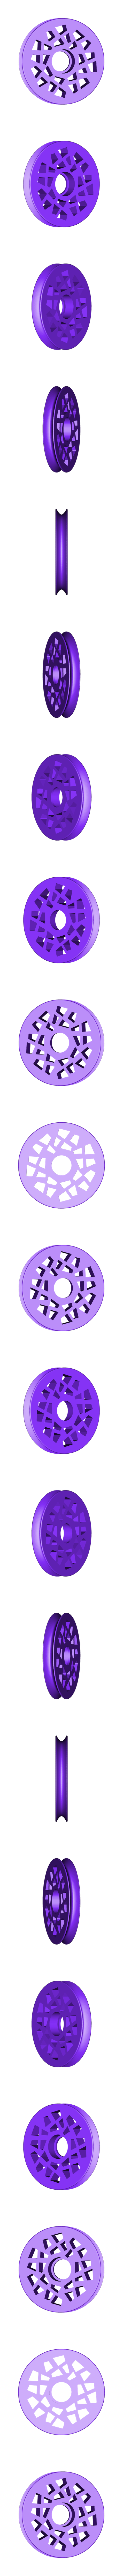 Rueda80mmCompletav0.2.stl Télécharger fichier STL gratuit Harrope Cable Cam GoPro v1.0 • Design pour imprimante 3D, GuillermoMaroto